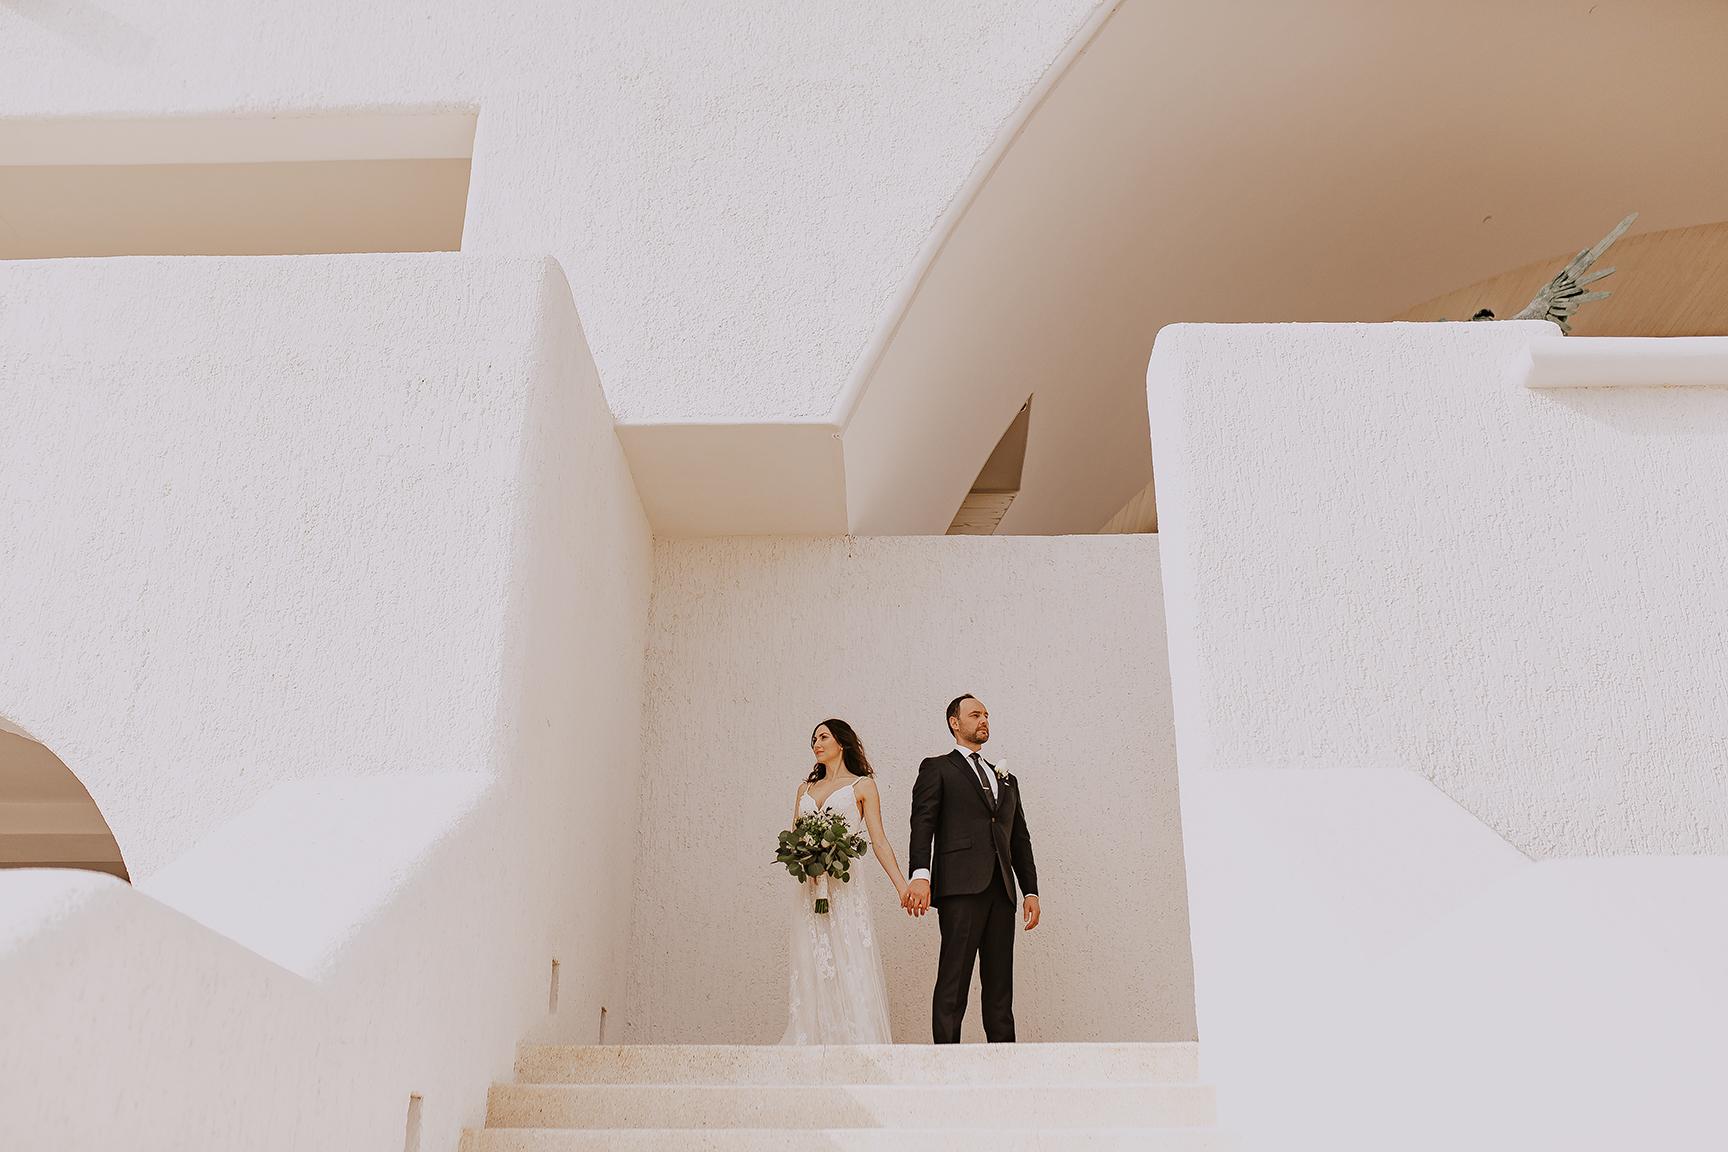 Lindsei+James_cabo_wedding_324.jpg